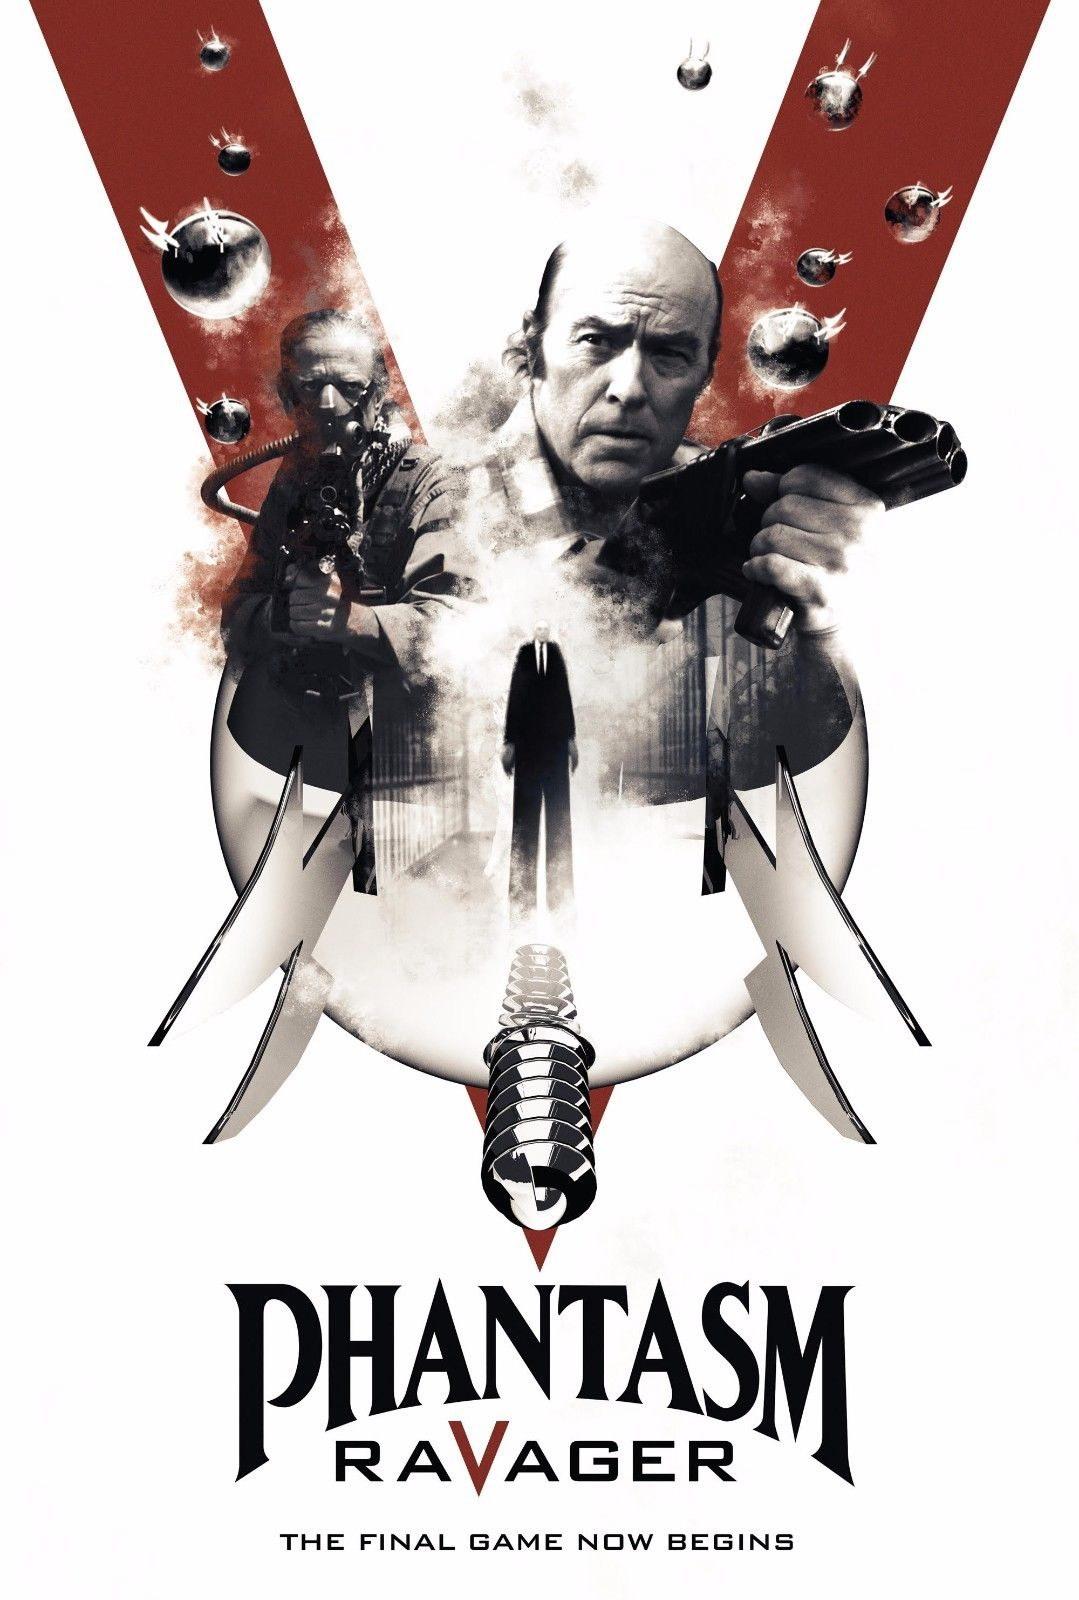 72552-PHANTASM-V-5-RAVAGER-Movie-The-Tall-Man-Horror-FRAMED-CANVAS-PRINT-Toile